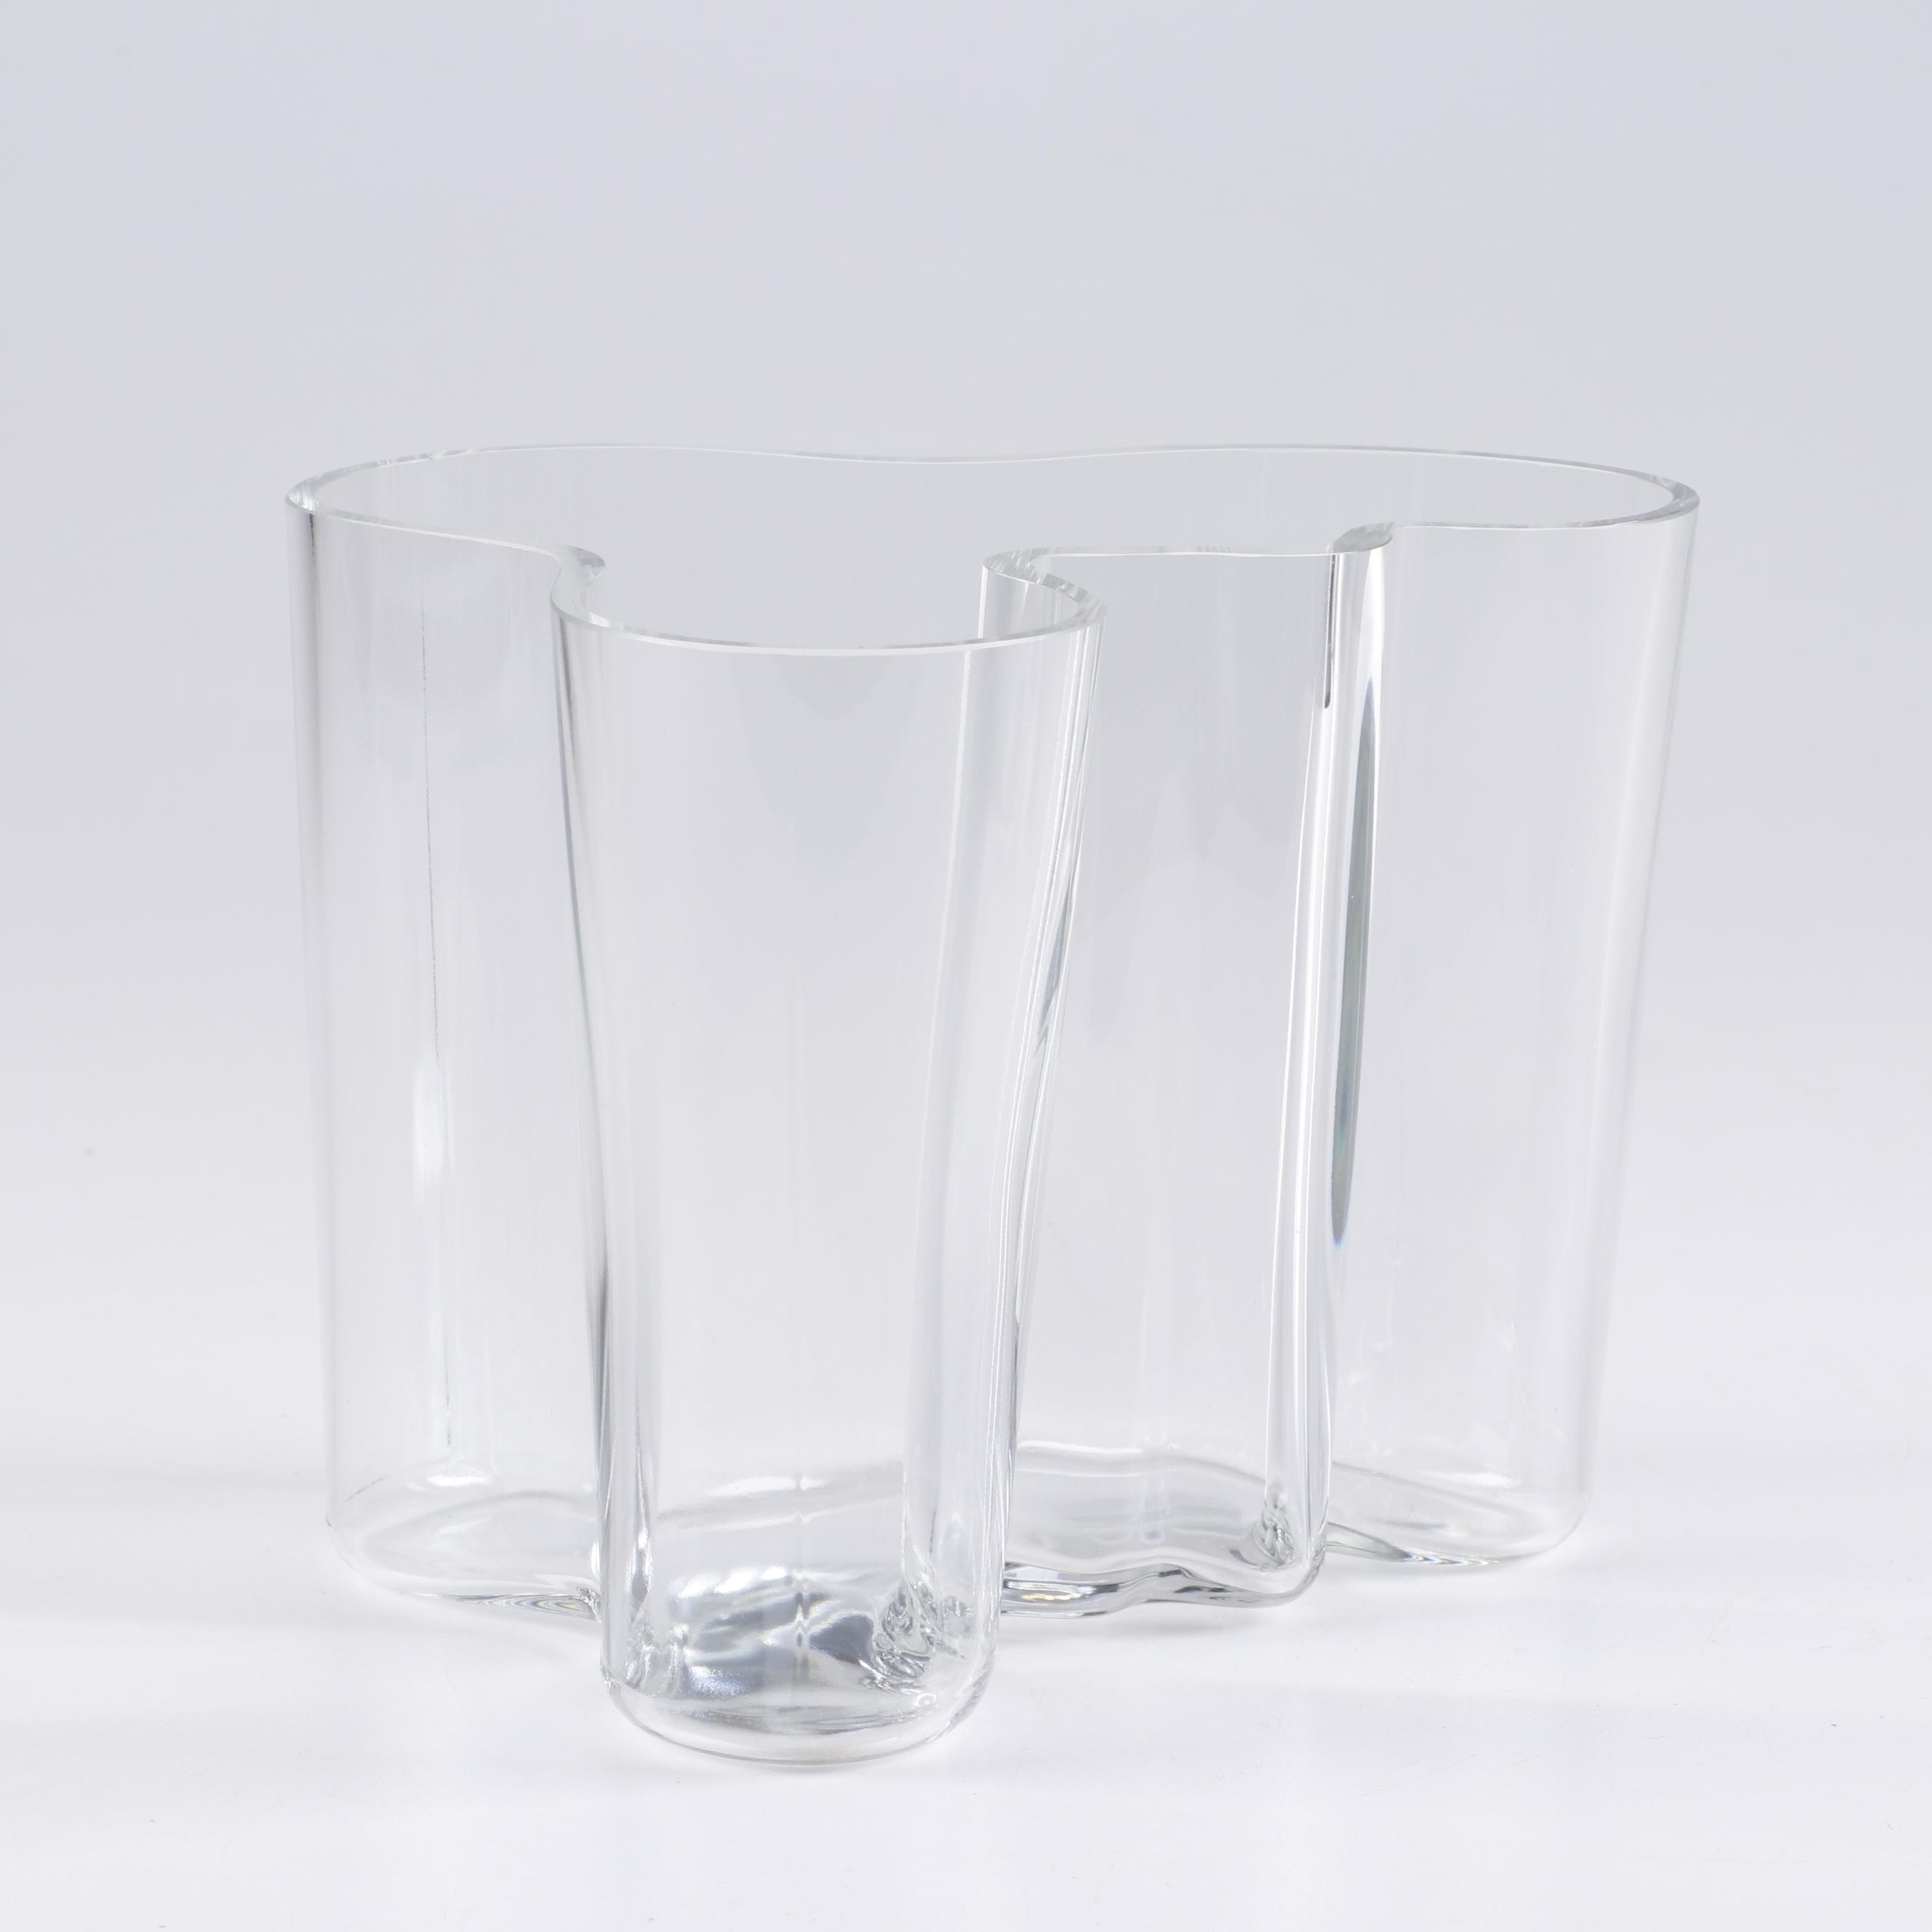 Alvar Aalto Wavy Glass Vase, Mid 20th Century